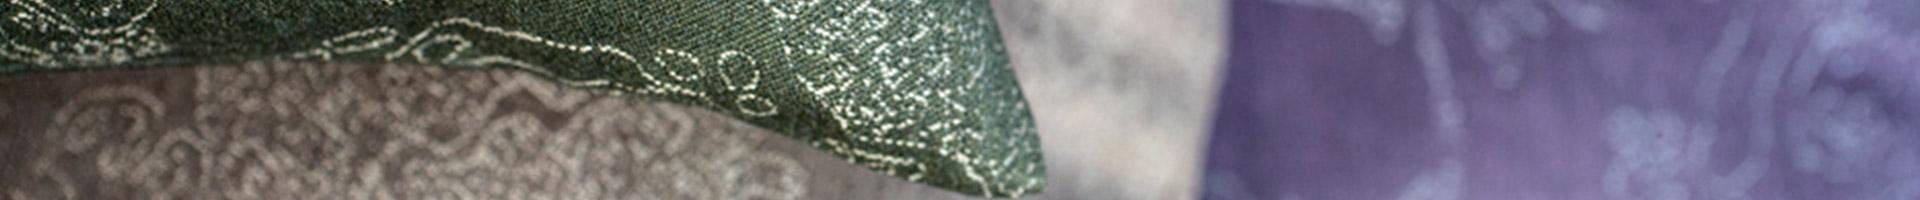 Melograno 100% wool decorative cushions